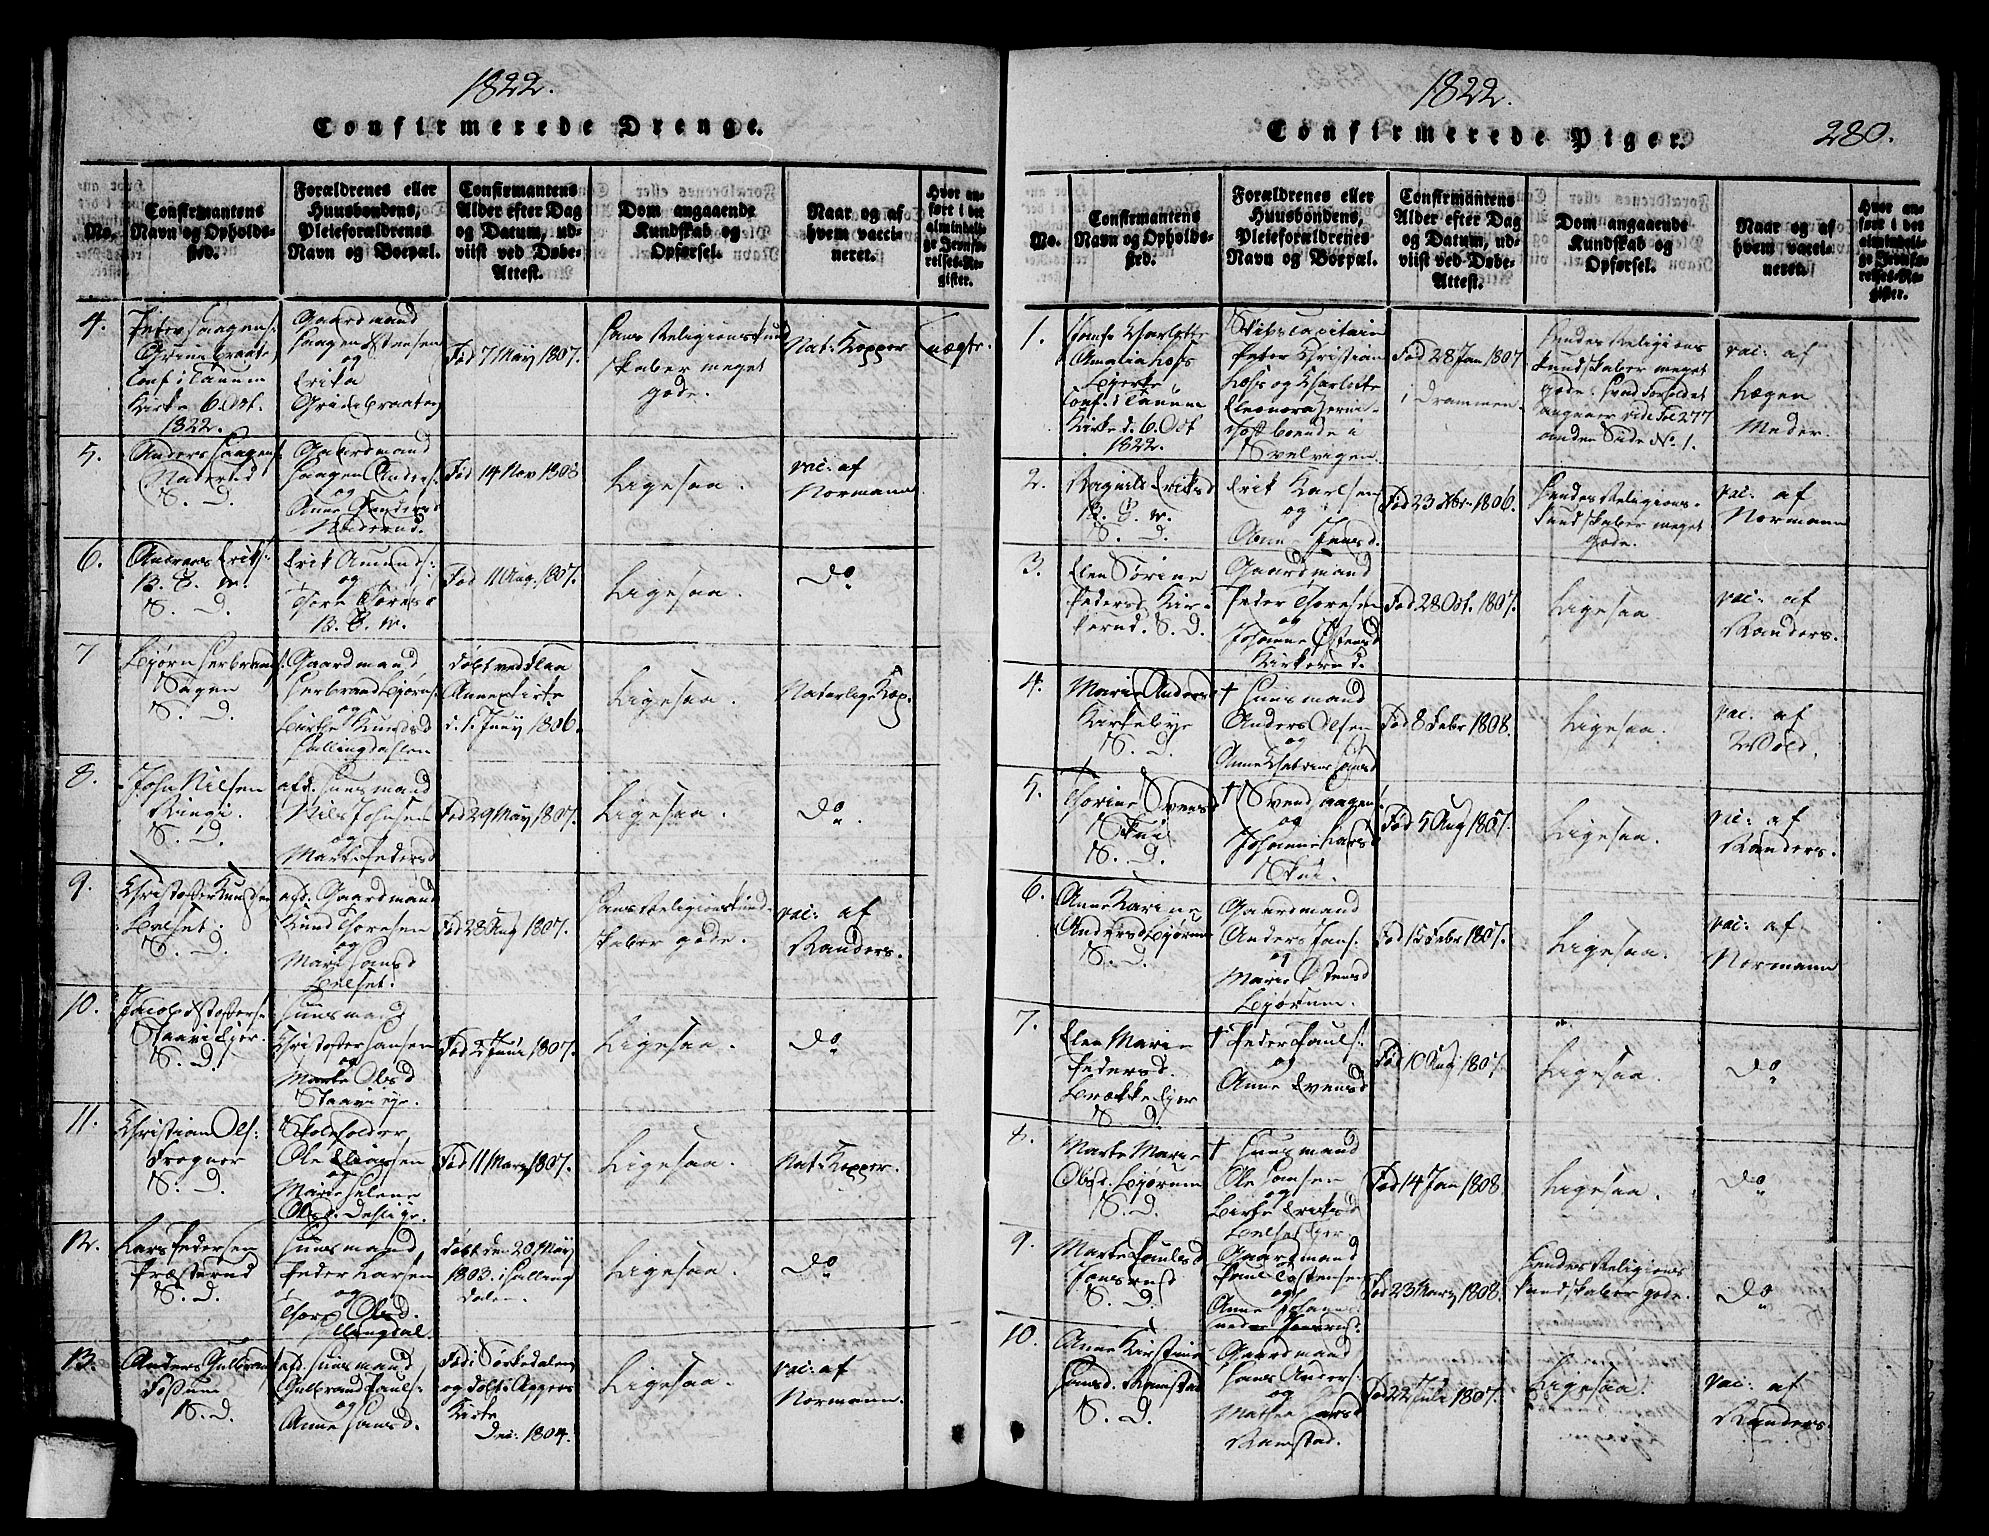 SAO, Asker prestekontor Kirkebøker, G/Ga/L0001: Klokkerbok nr. I 1, 1814-1830, s. 280